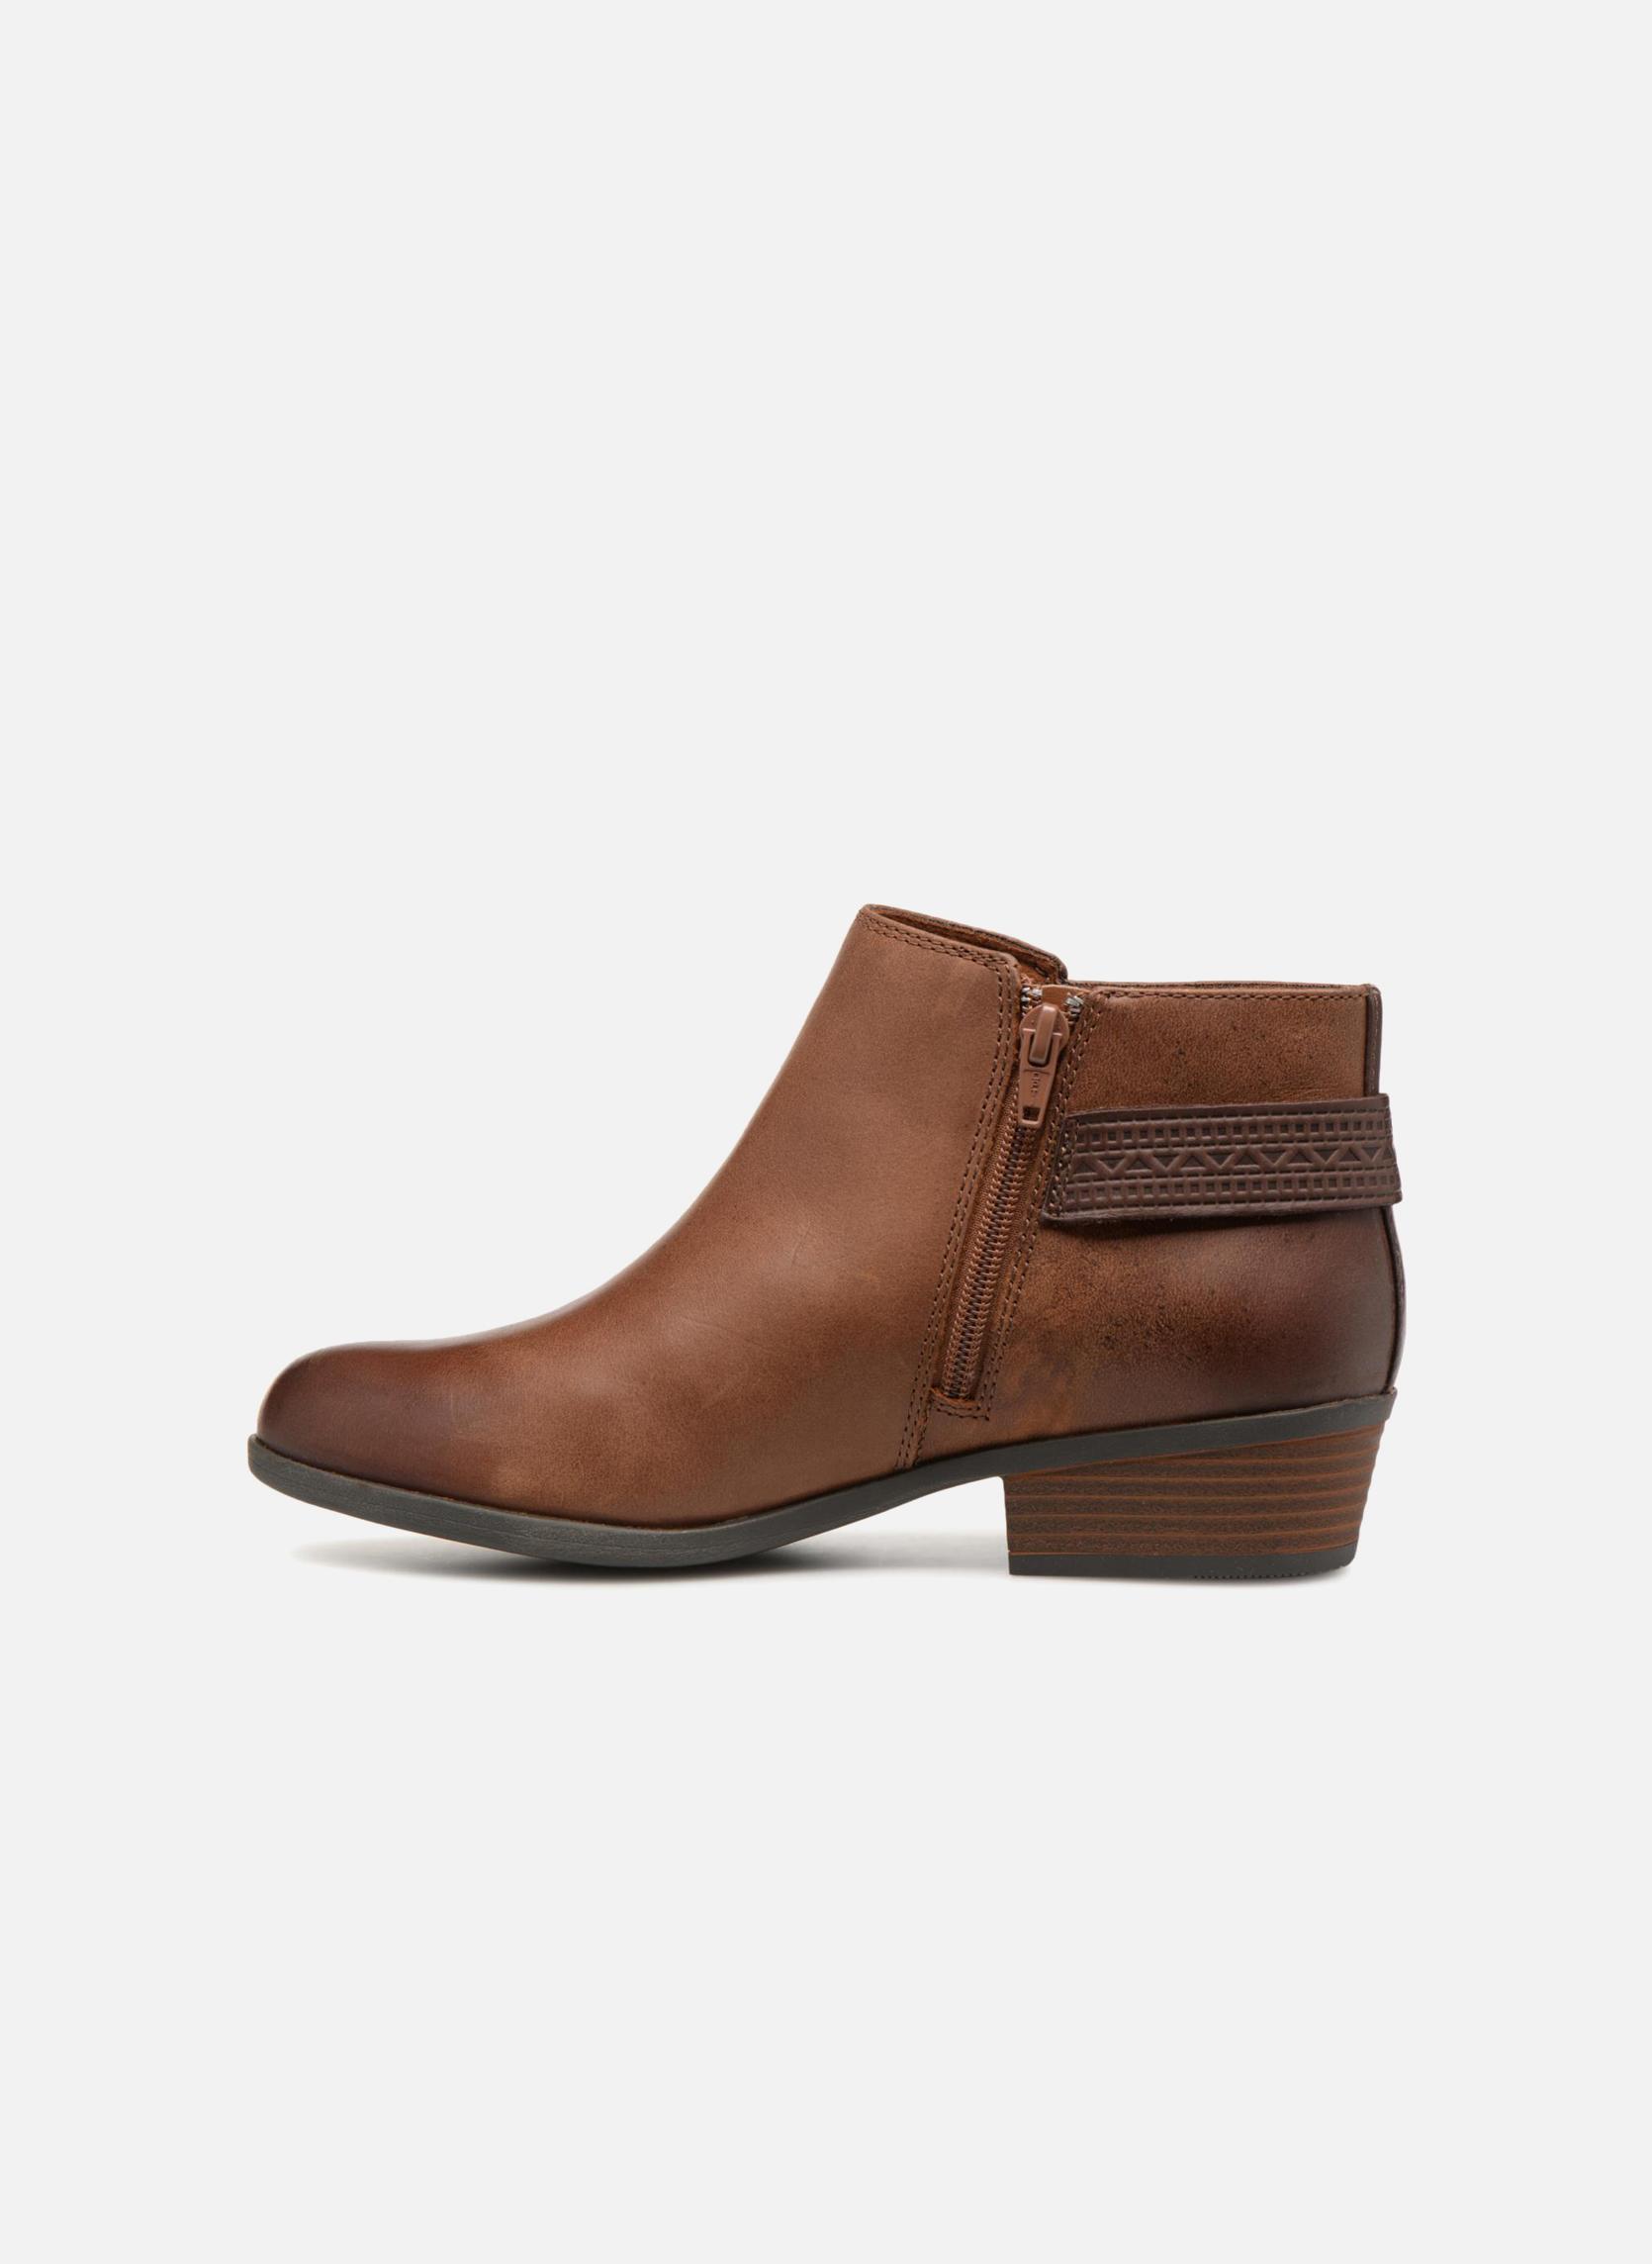 Clarks mujer Addiy Kara Leather Almond Toe Ankle Fashion, Tan Leather, Talla 9.0